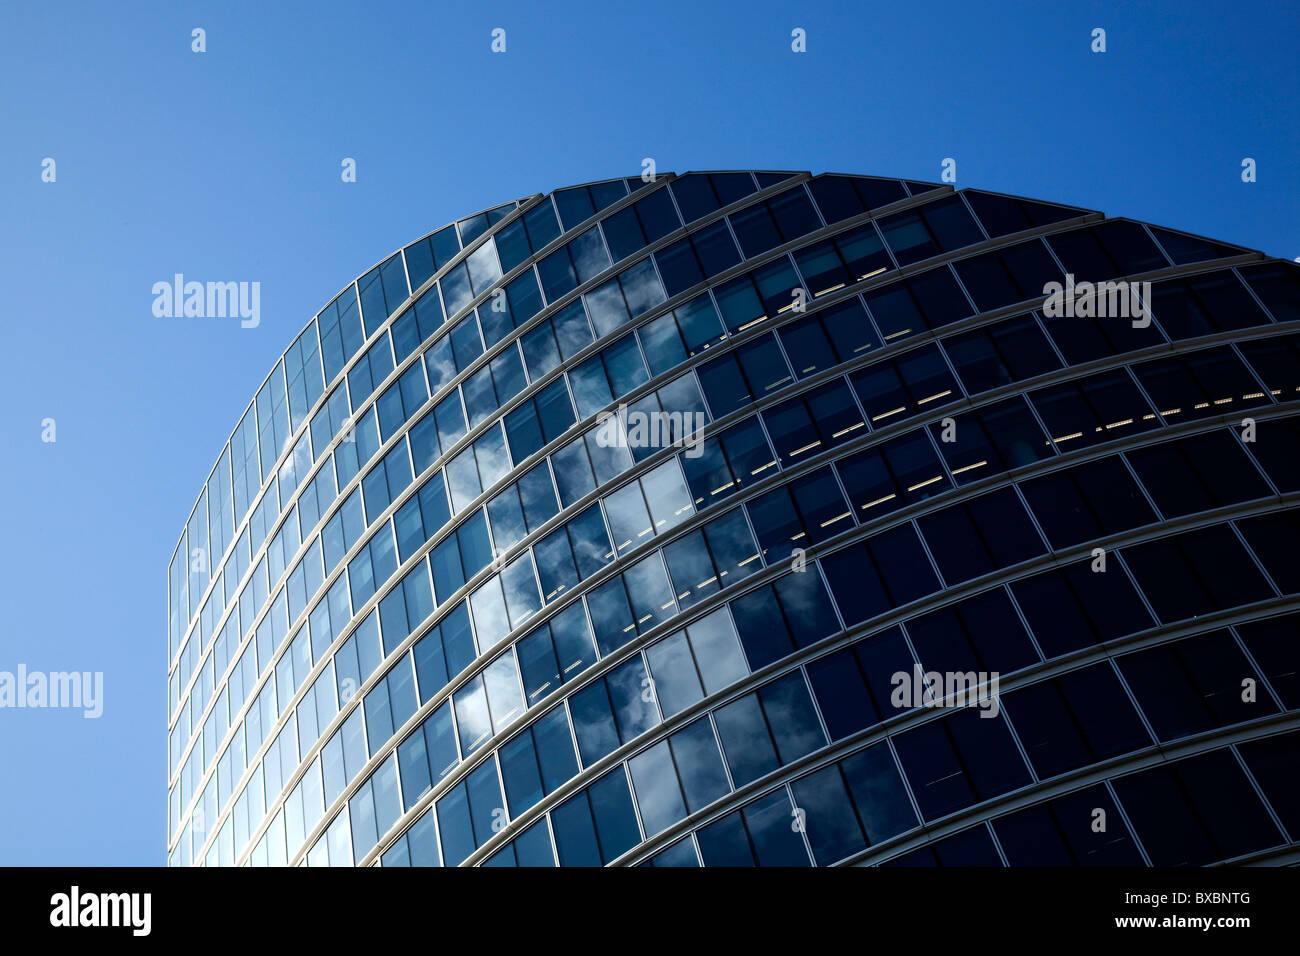 Modern architecture in London, England, United Kingdom, Europe Stock Photo